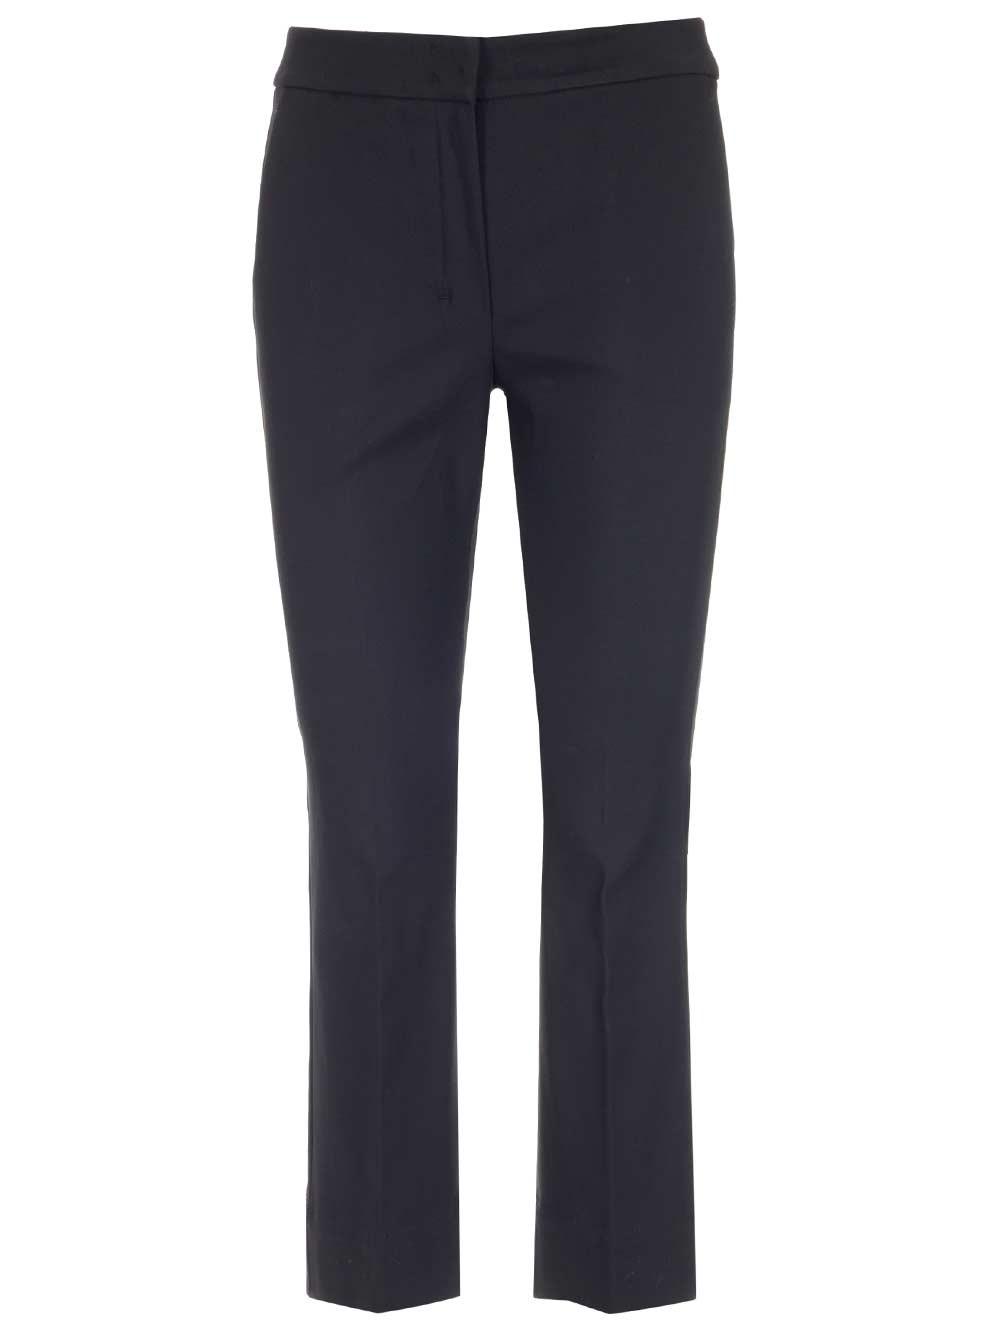 'S MAX MARA 'Alcali' Cropped Trousers